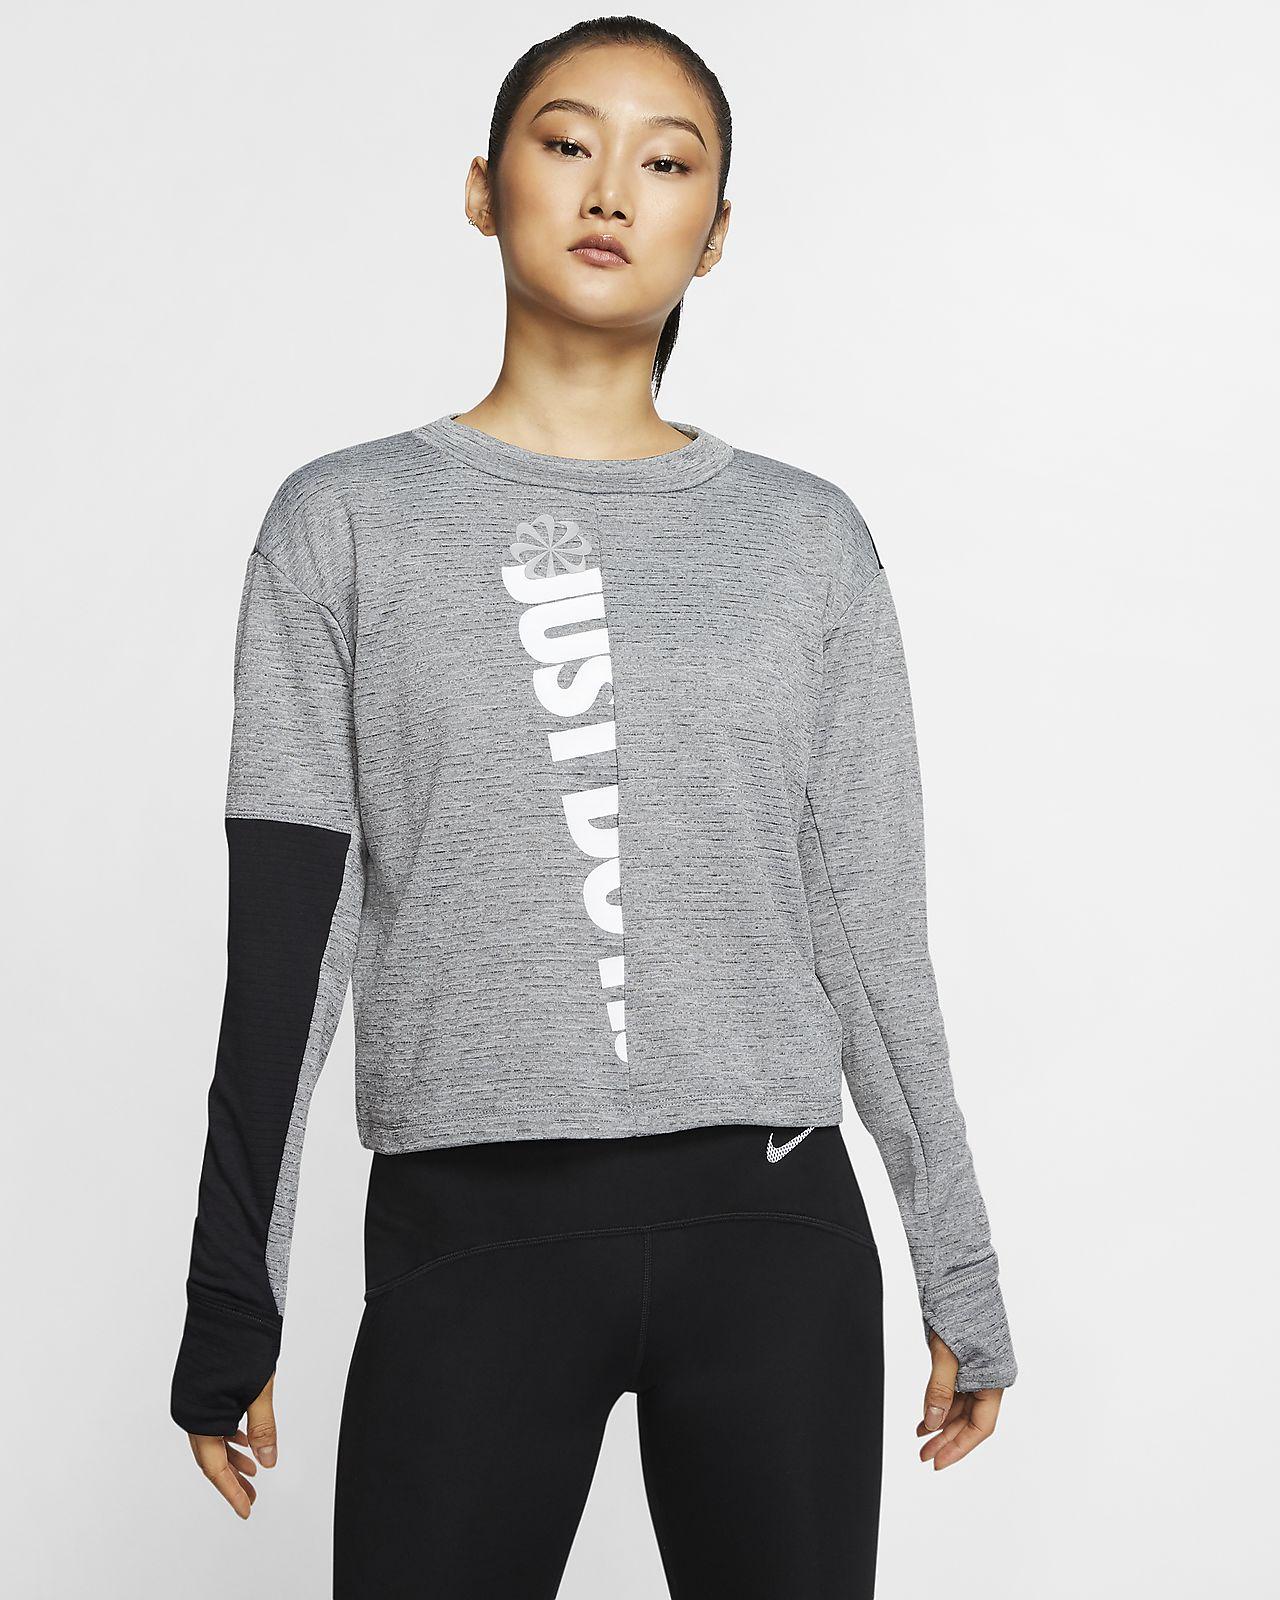 Prenda para la parte superior de running de manga larga para mujer Nike Therma Sphere Icon Clash